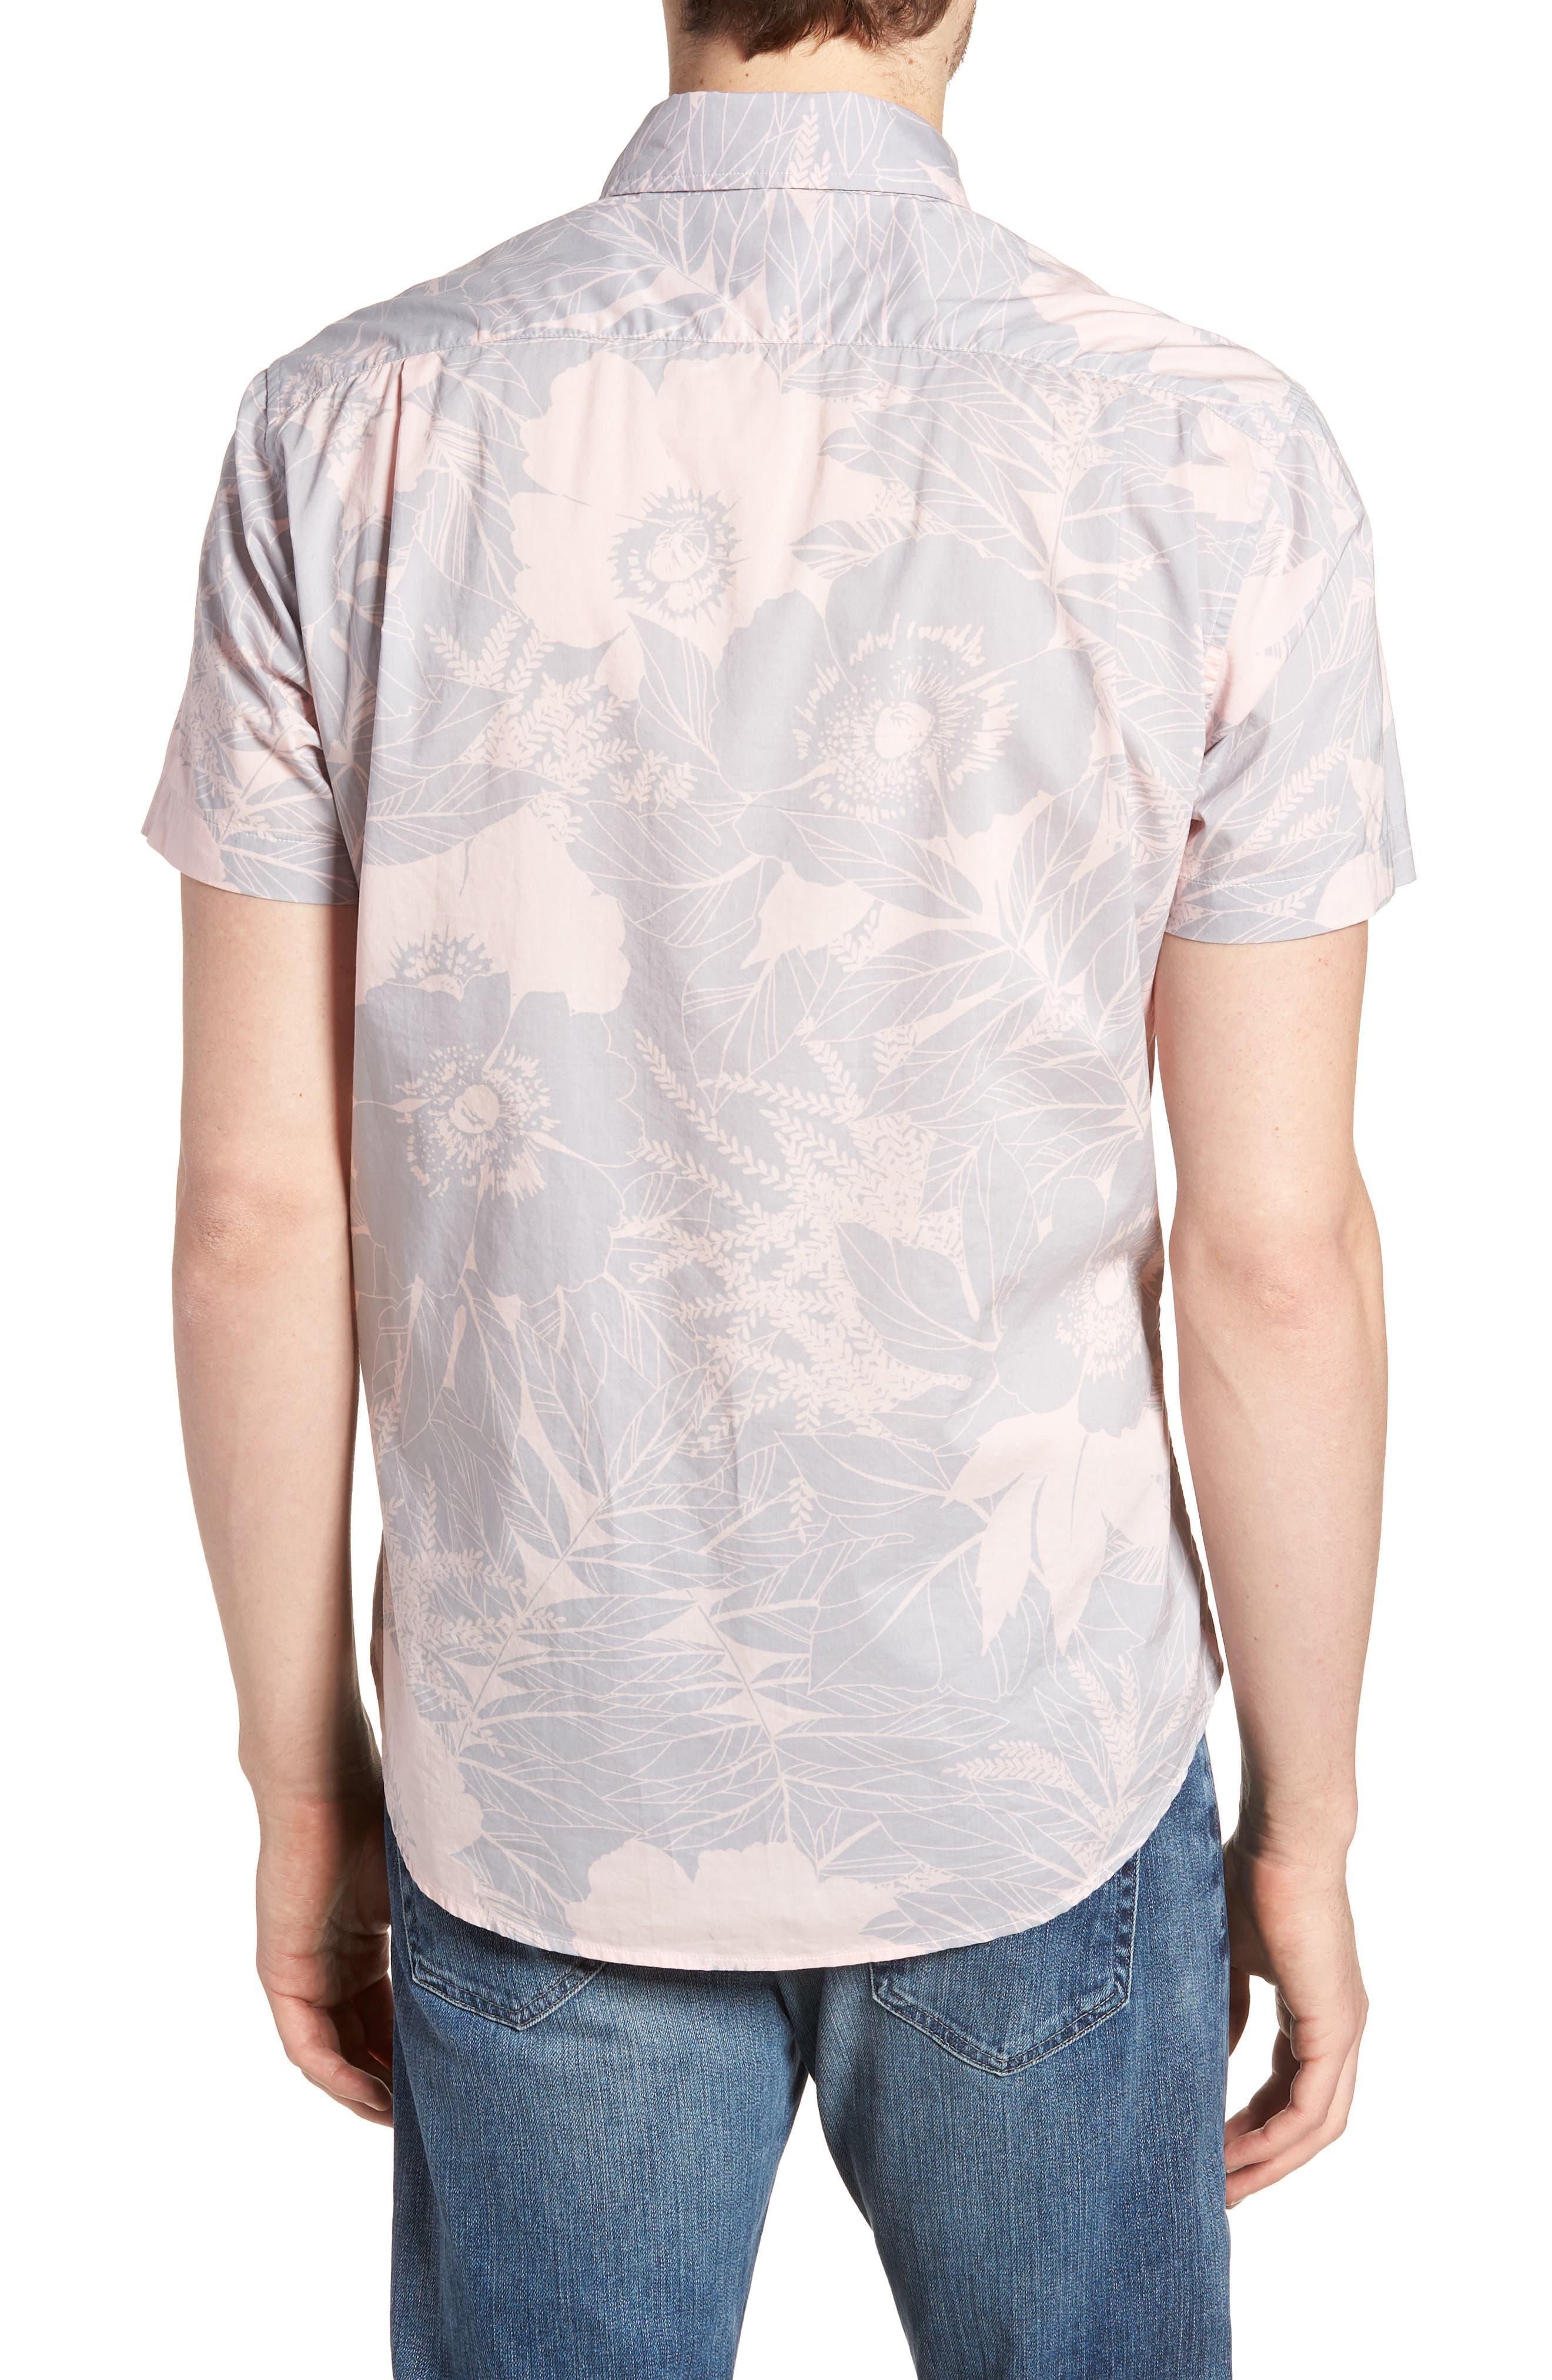 Riviera Slim Fit Floral Print Sport Shirt,                             Alternate thumbnail 2, color,                             LINEAR FLORAL - SKIVVY PINK